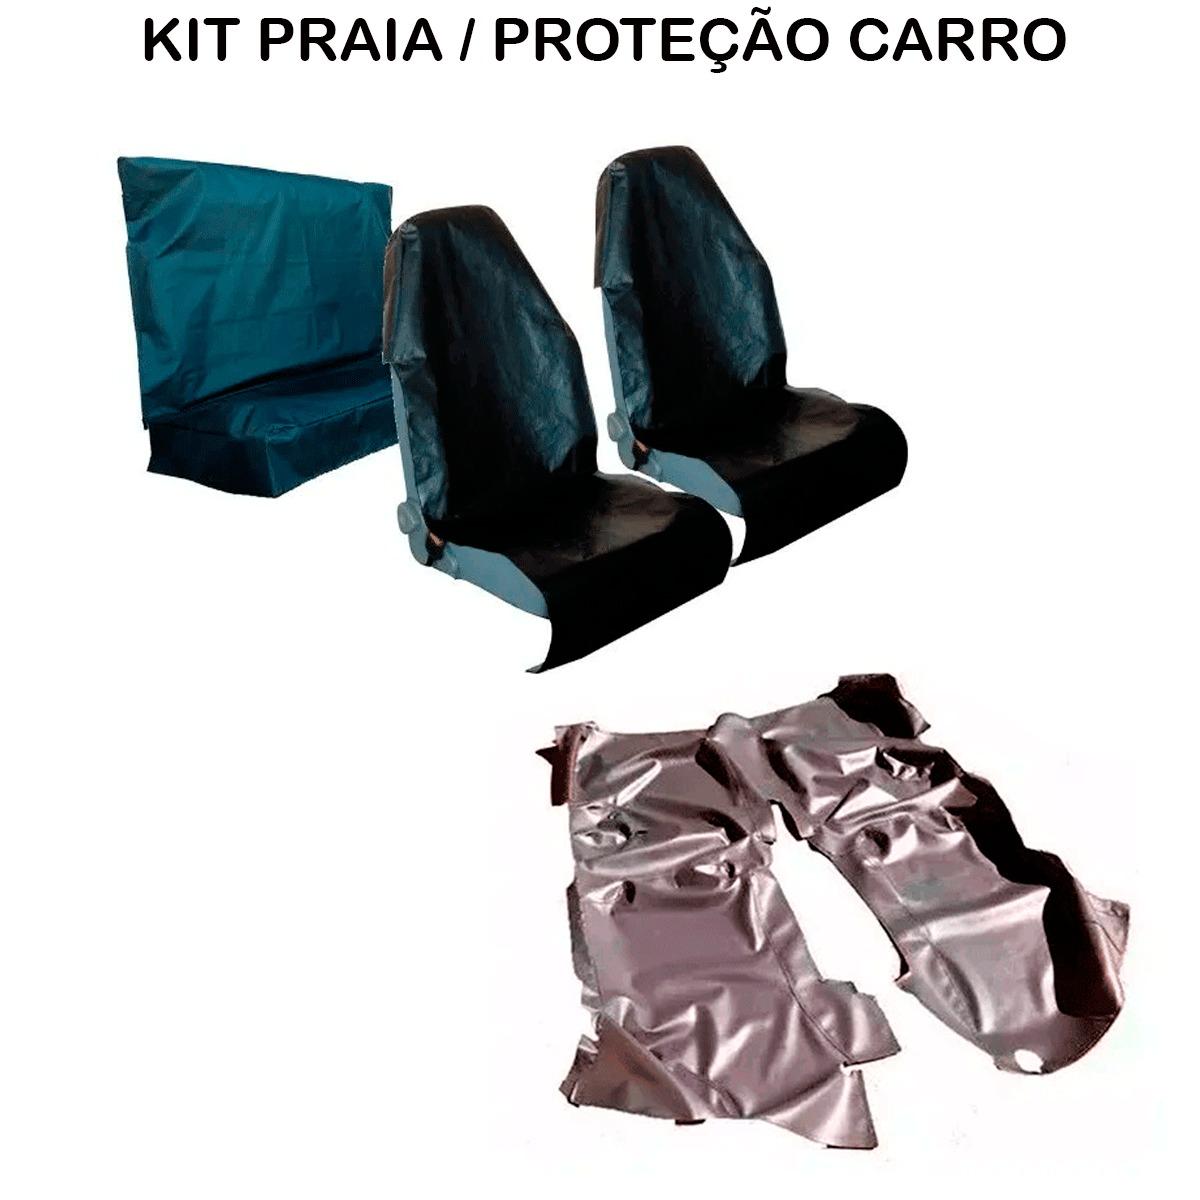 Tapete Em Vinil Fiat Uno 2015 a 2020 + Capa Banco Protecao Banco Areia Suor Academia